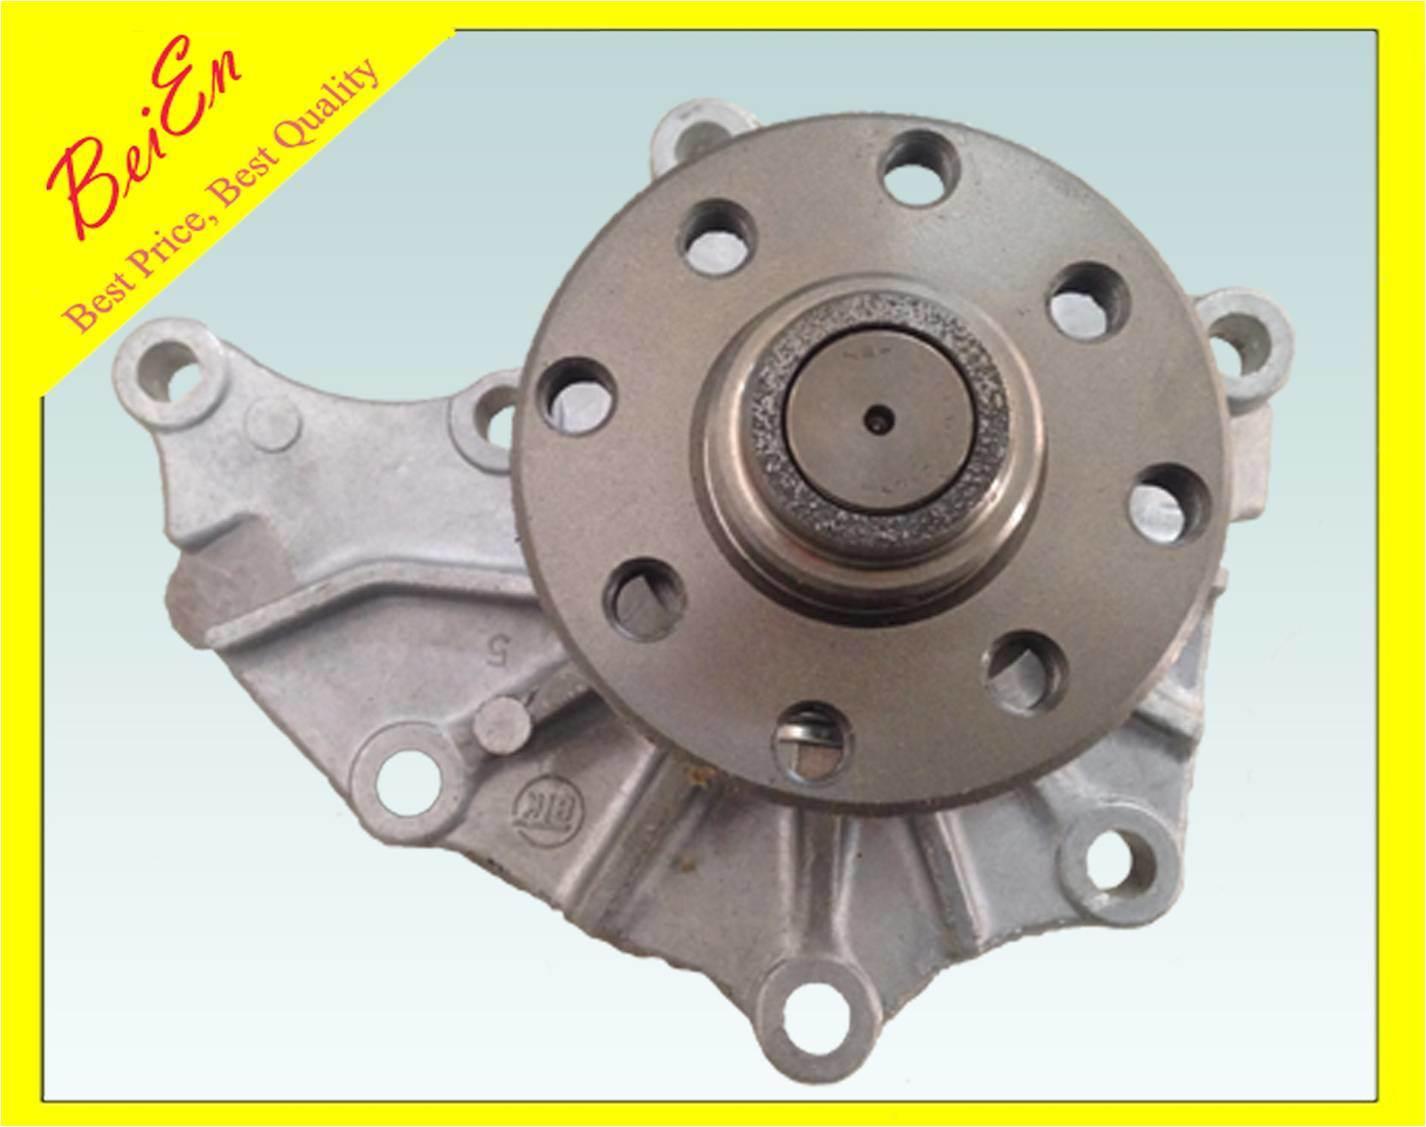 hight resolution of china genuine water pump for isuzu excavator engine 6hk1 1 13650079 0 china water pump pump